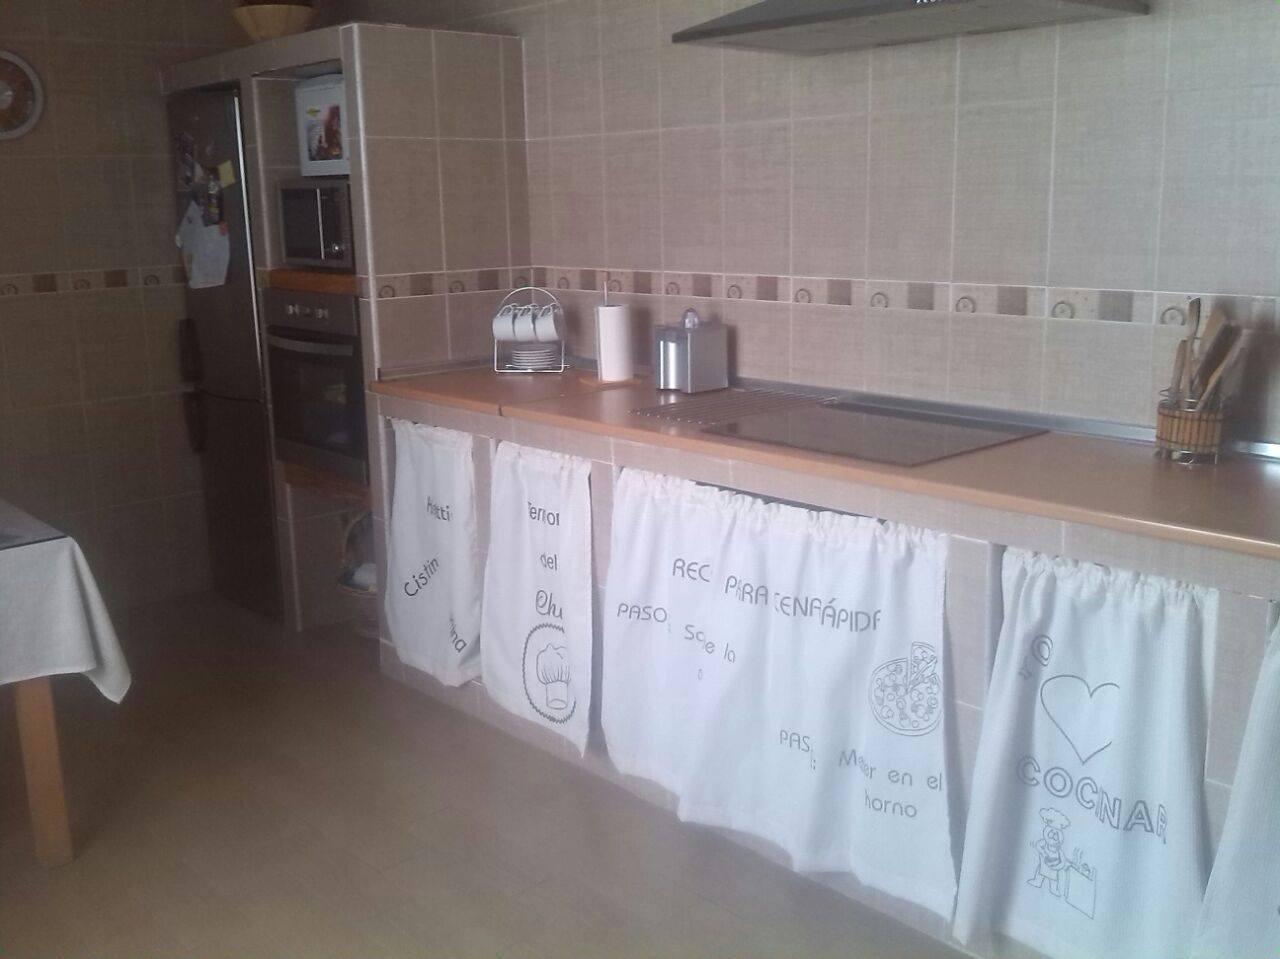 Cortinas para cocina mamposter a la boutique del peque for Cocinas de mamposteria